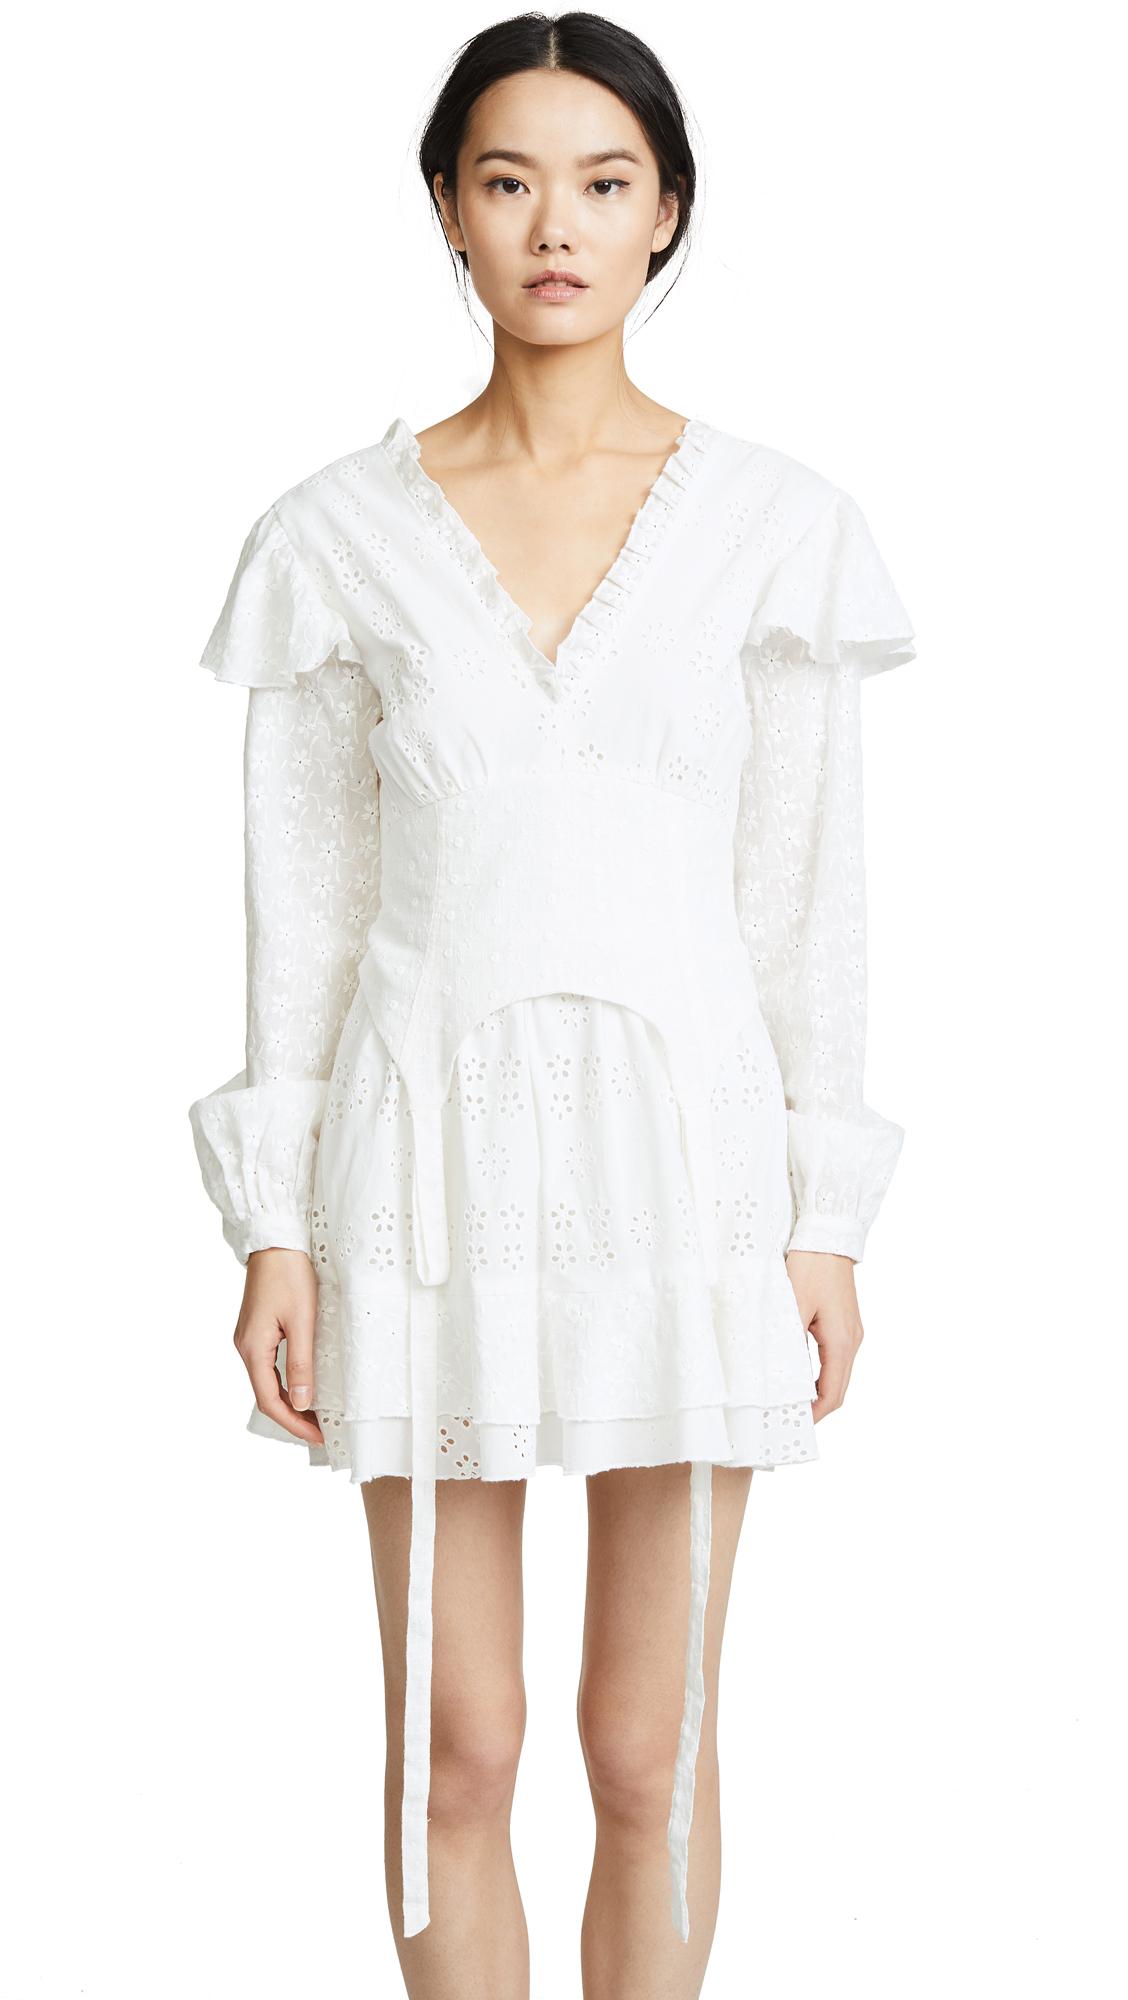 SANDY LIANG YACHTY DRESS